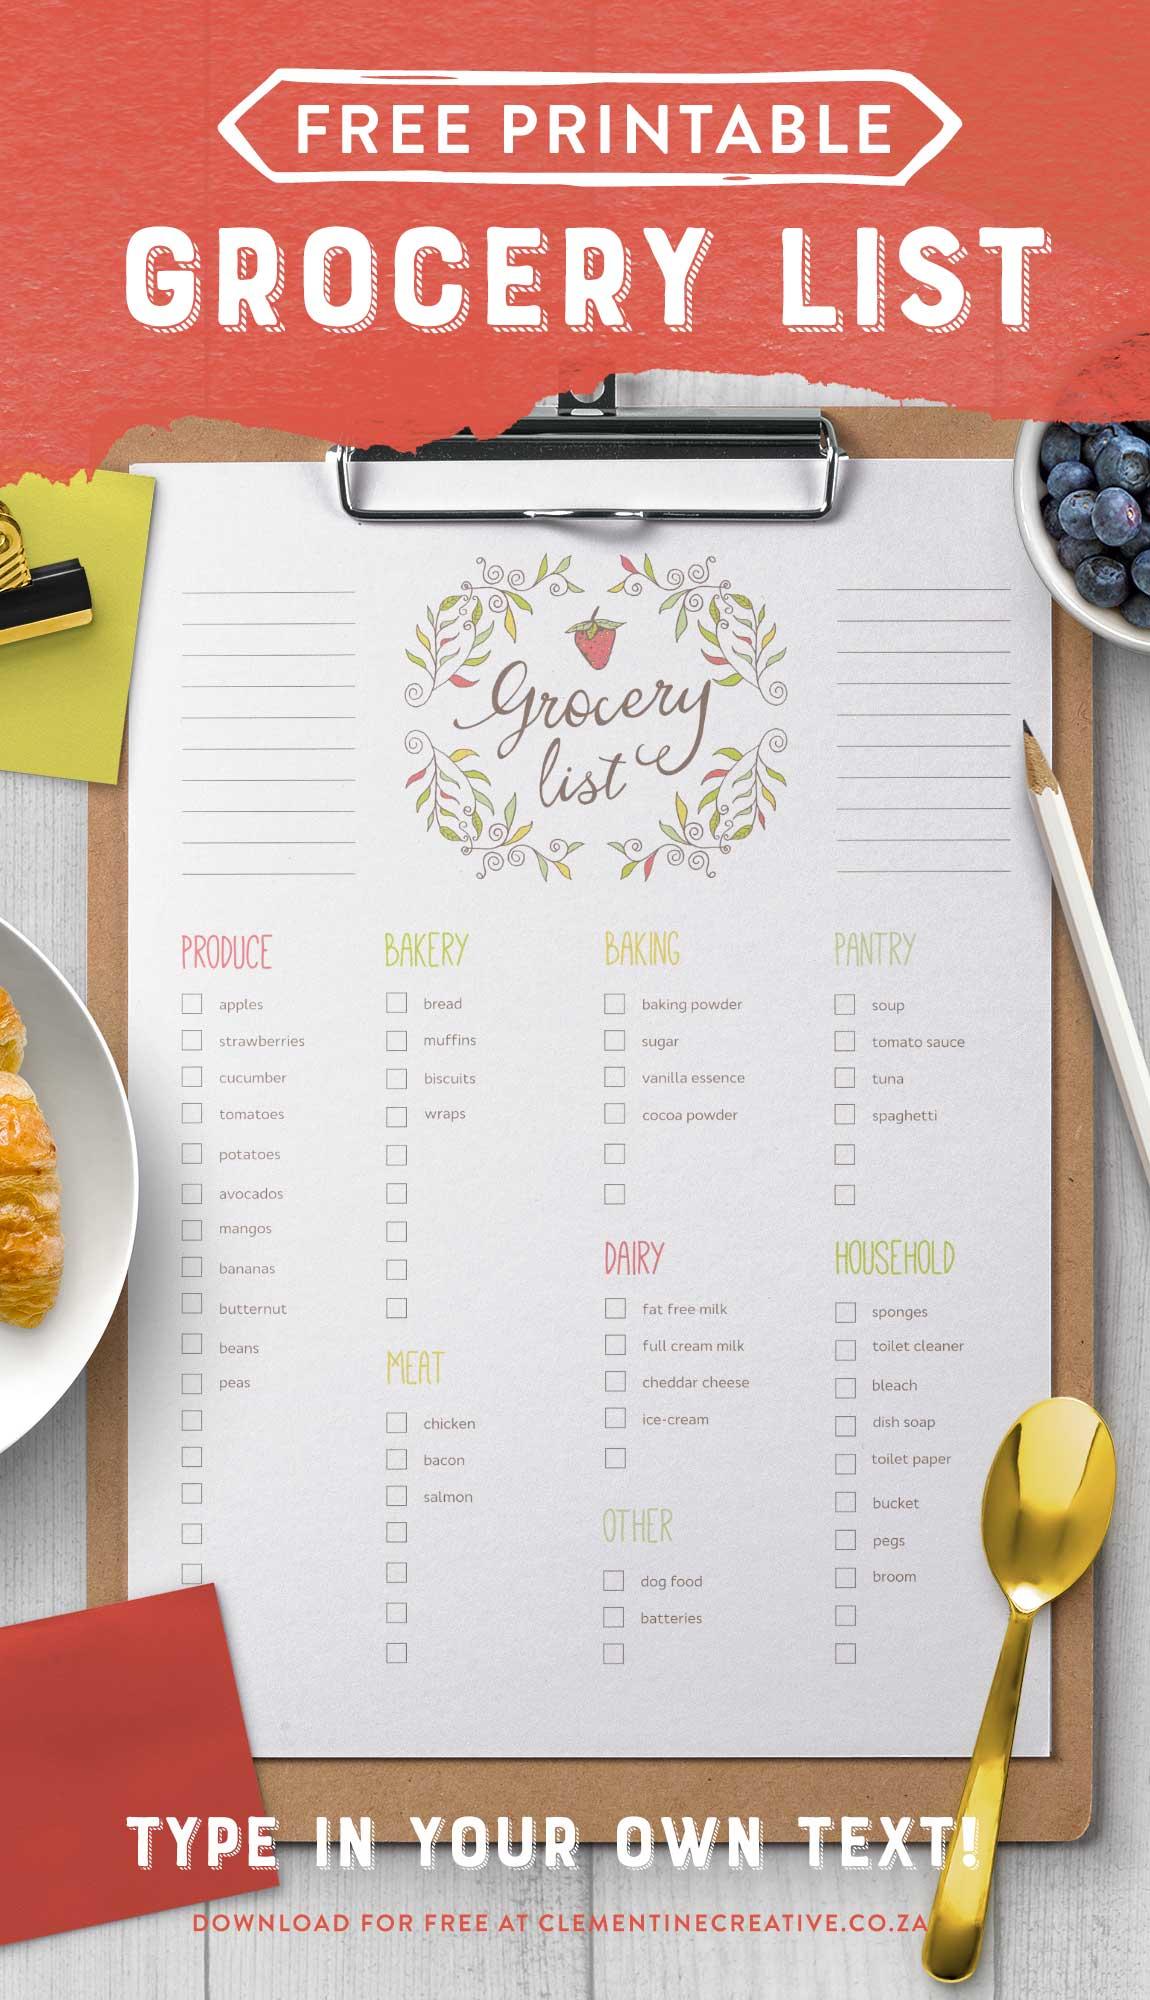 Free Editable Grocery List {Printable Pdf} throughout Editable Grocery List Template